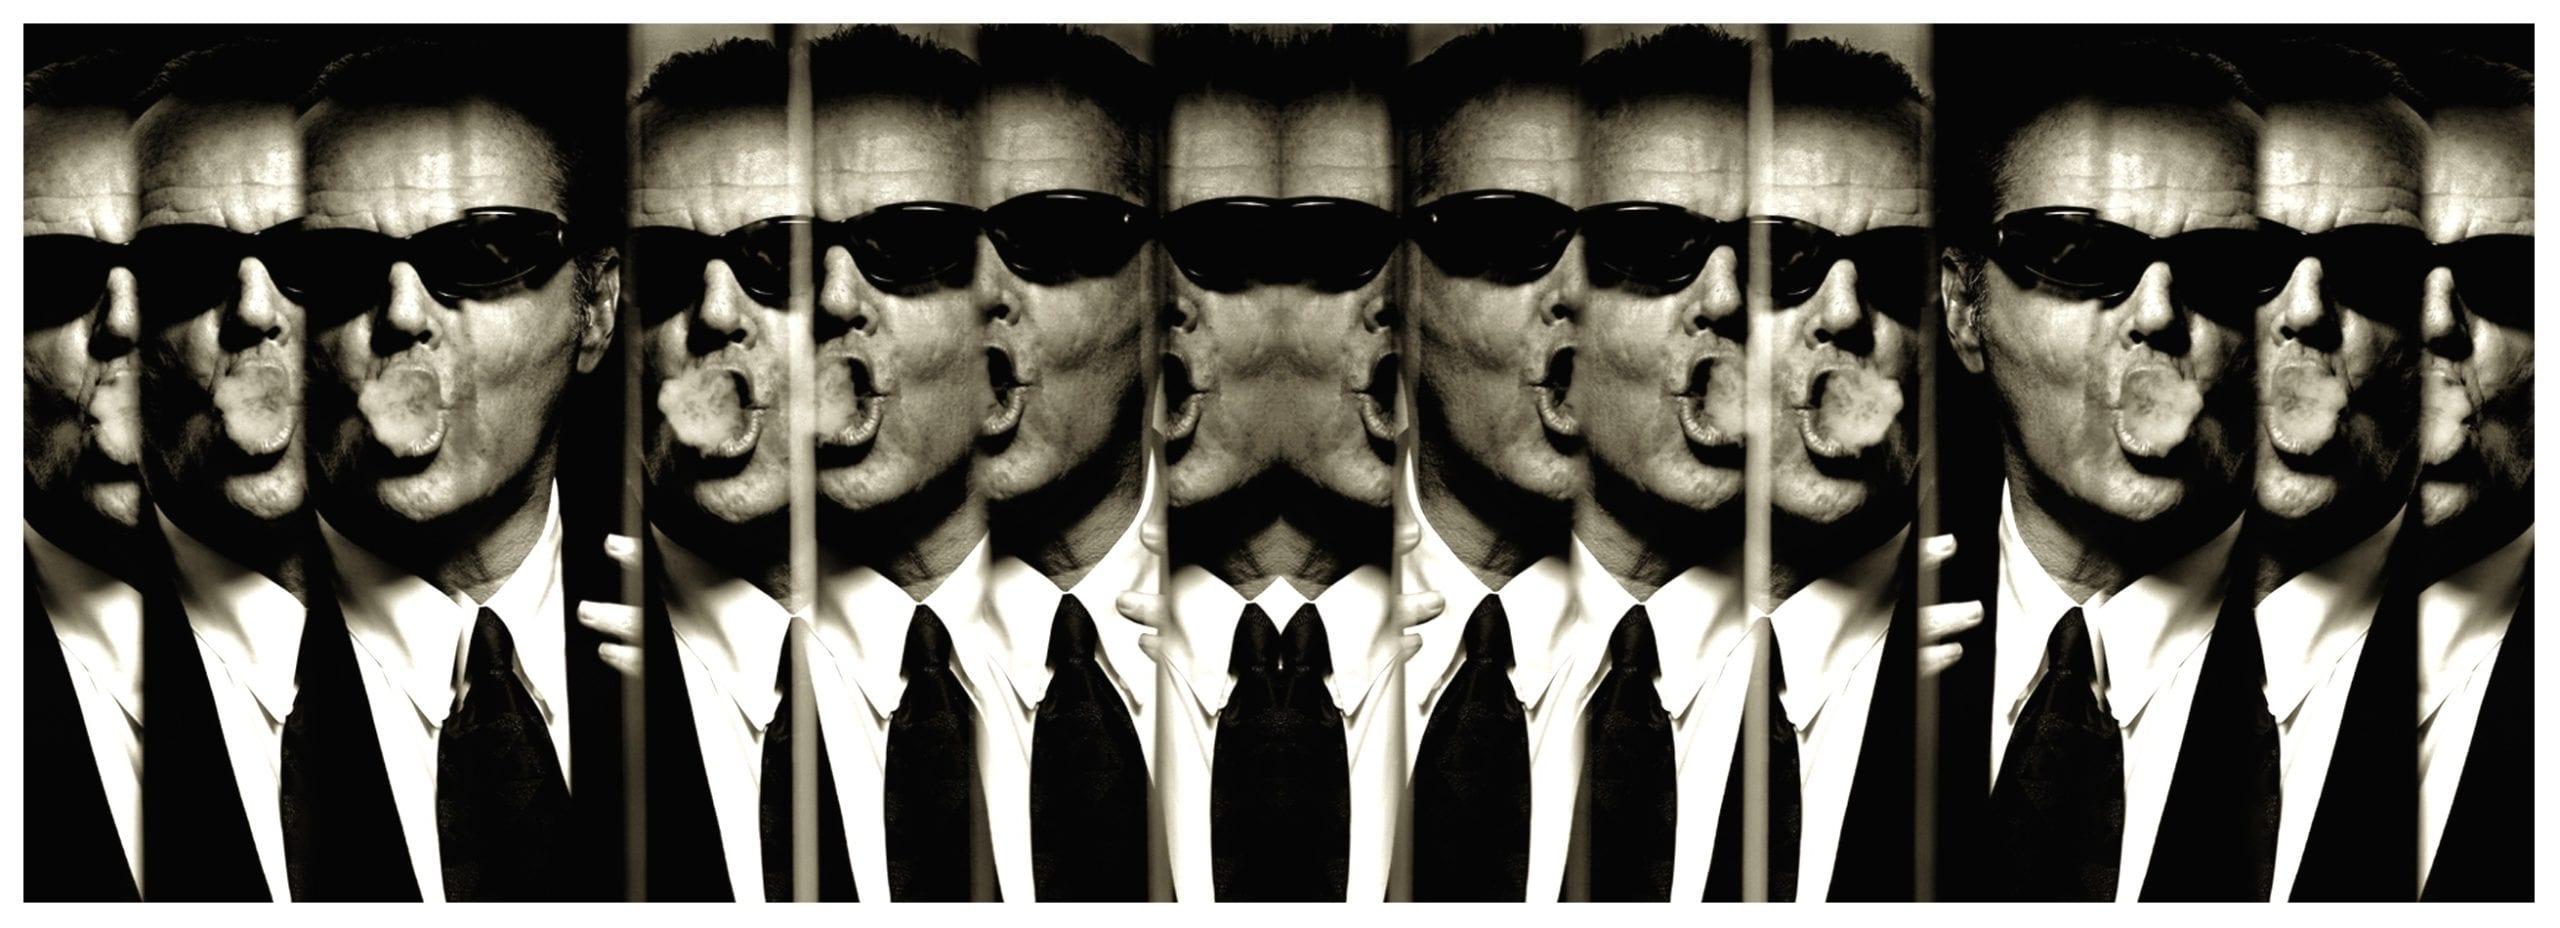 Albert Watson, Jack Nicholson IV, New York City, 1998